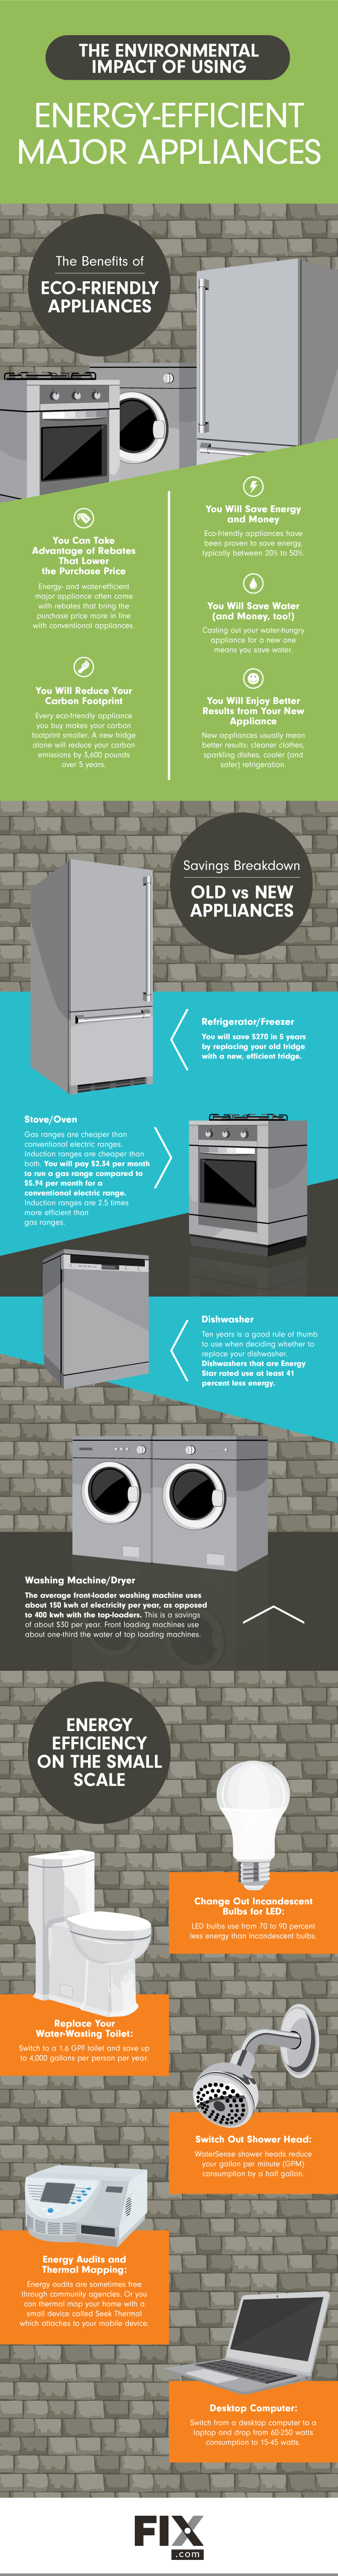 The Benefits Of Energy Efficient Appliances Energy Efficient Appliances Energy Efficiency Carbon Footprint